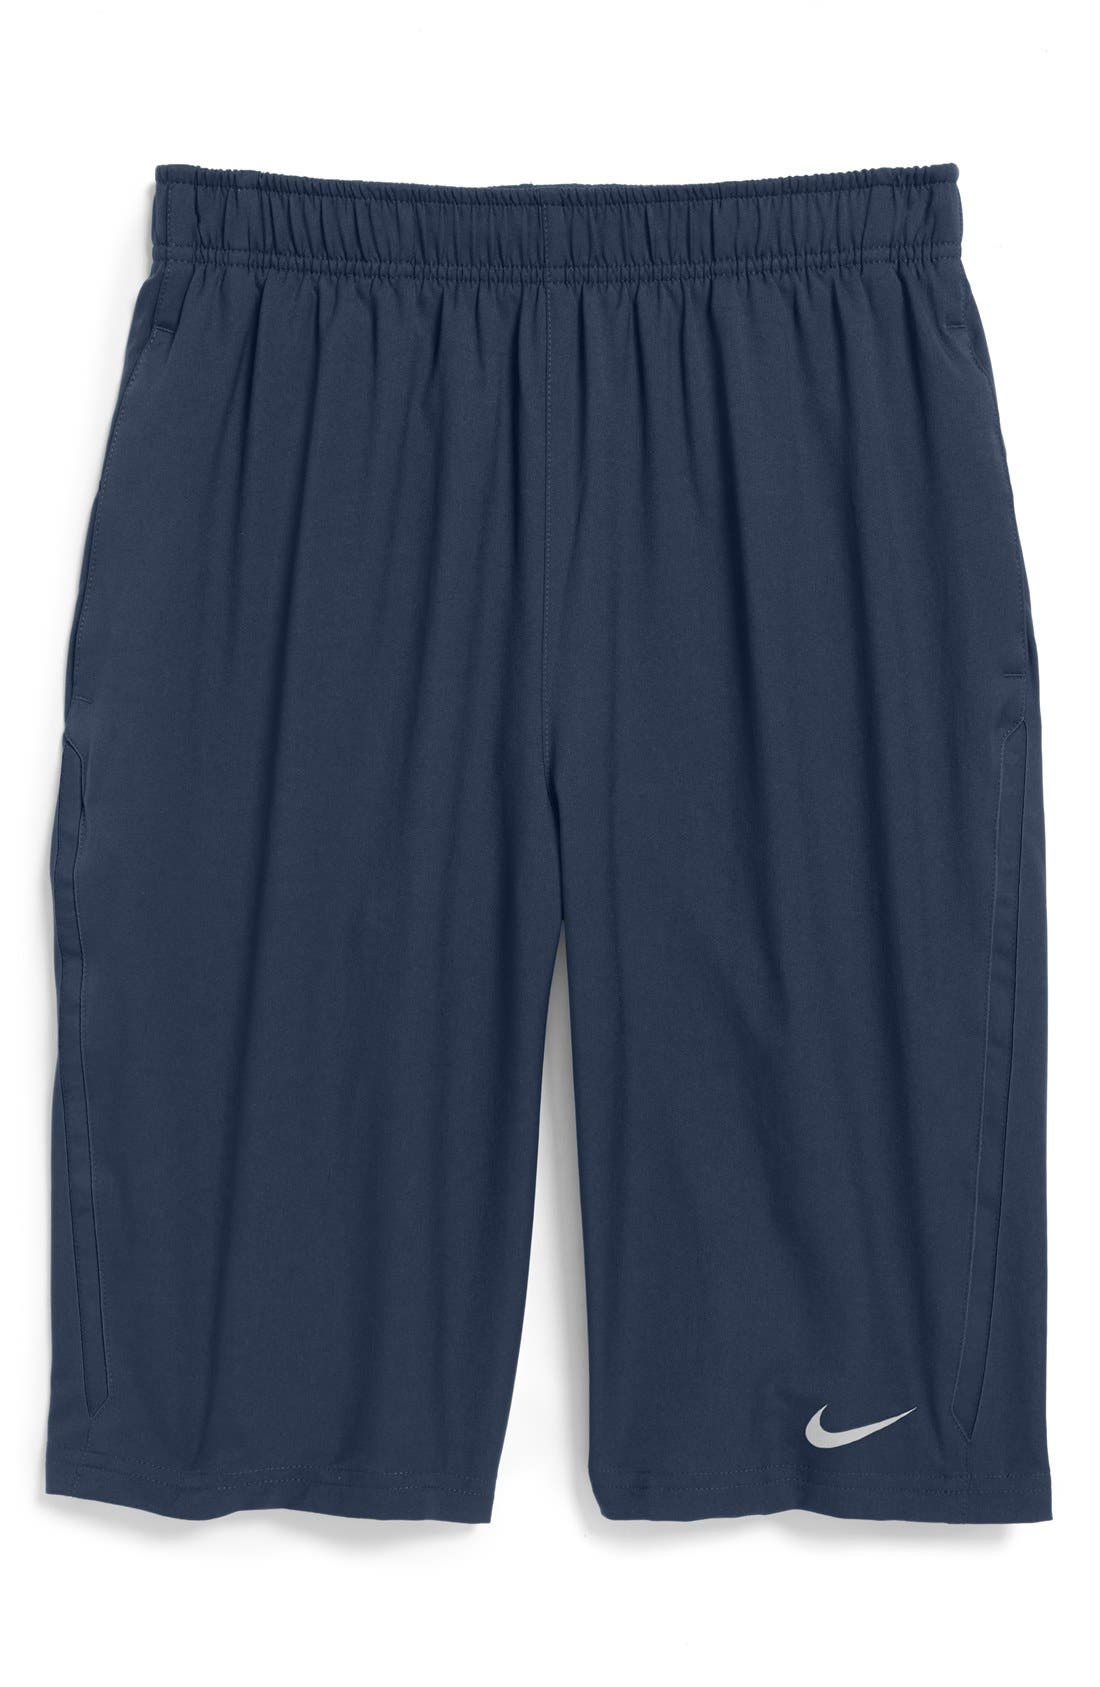 Alternate Image 1 Selected - Nike 'Boarder' Tennis Shorts (Big Boys)